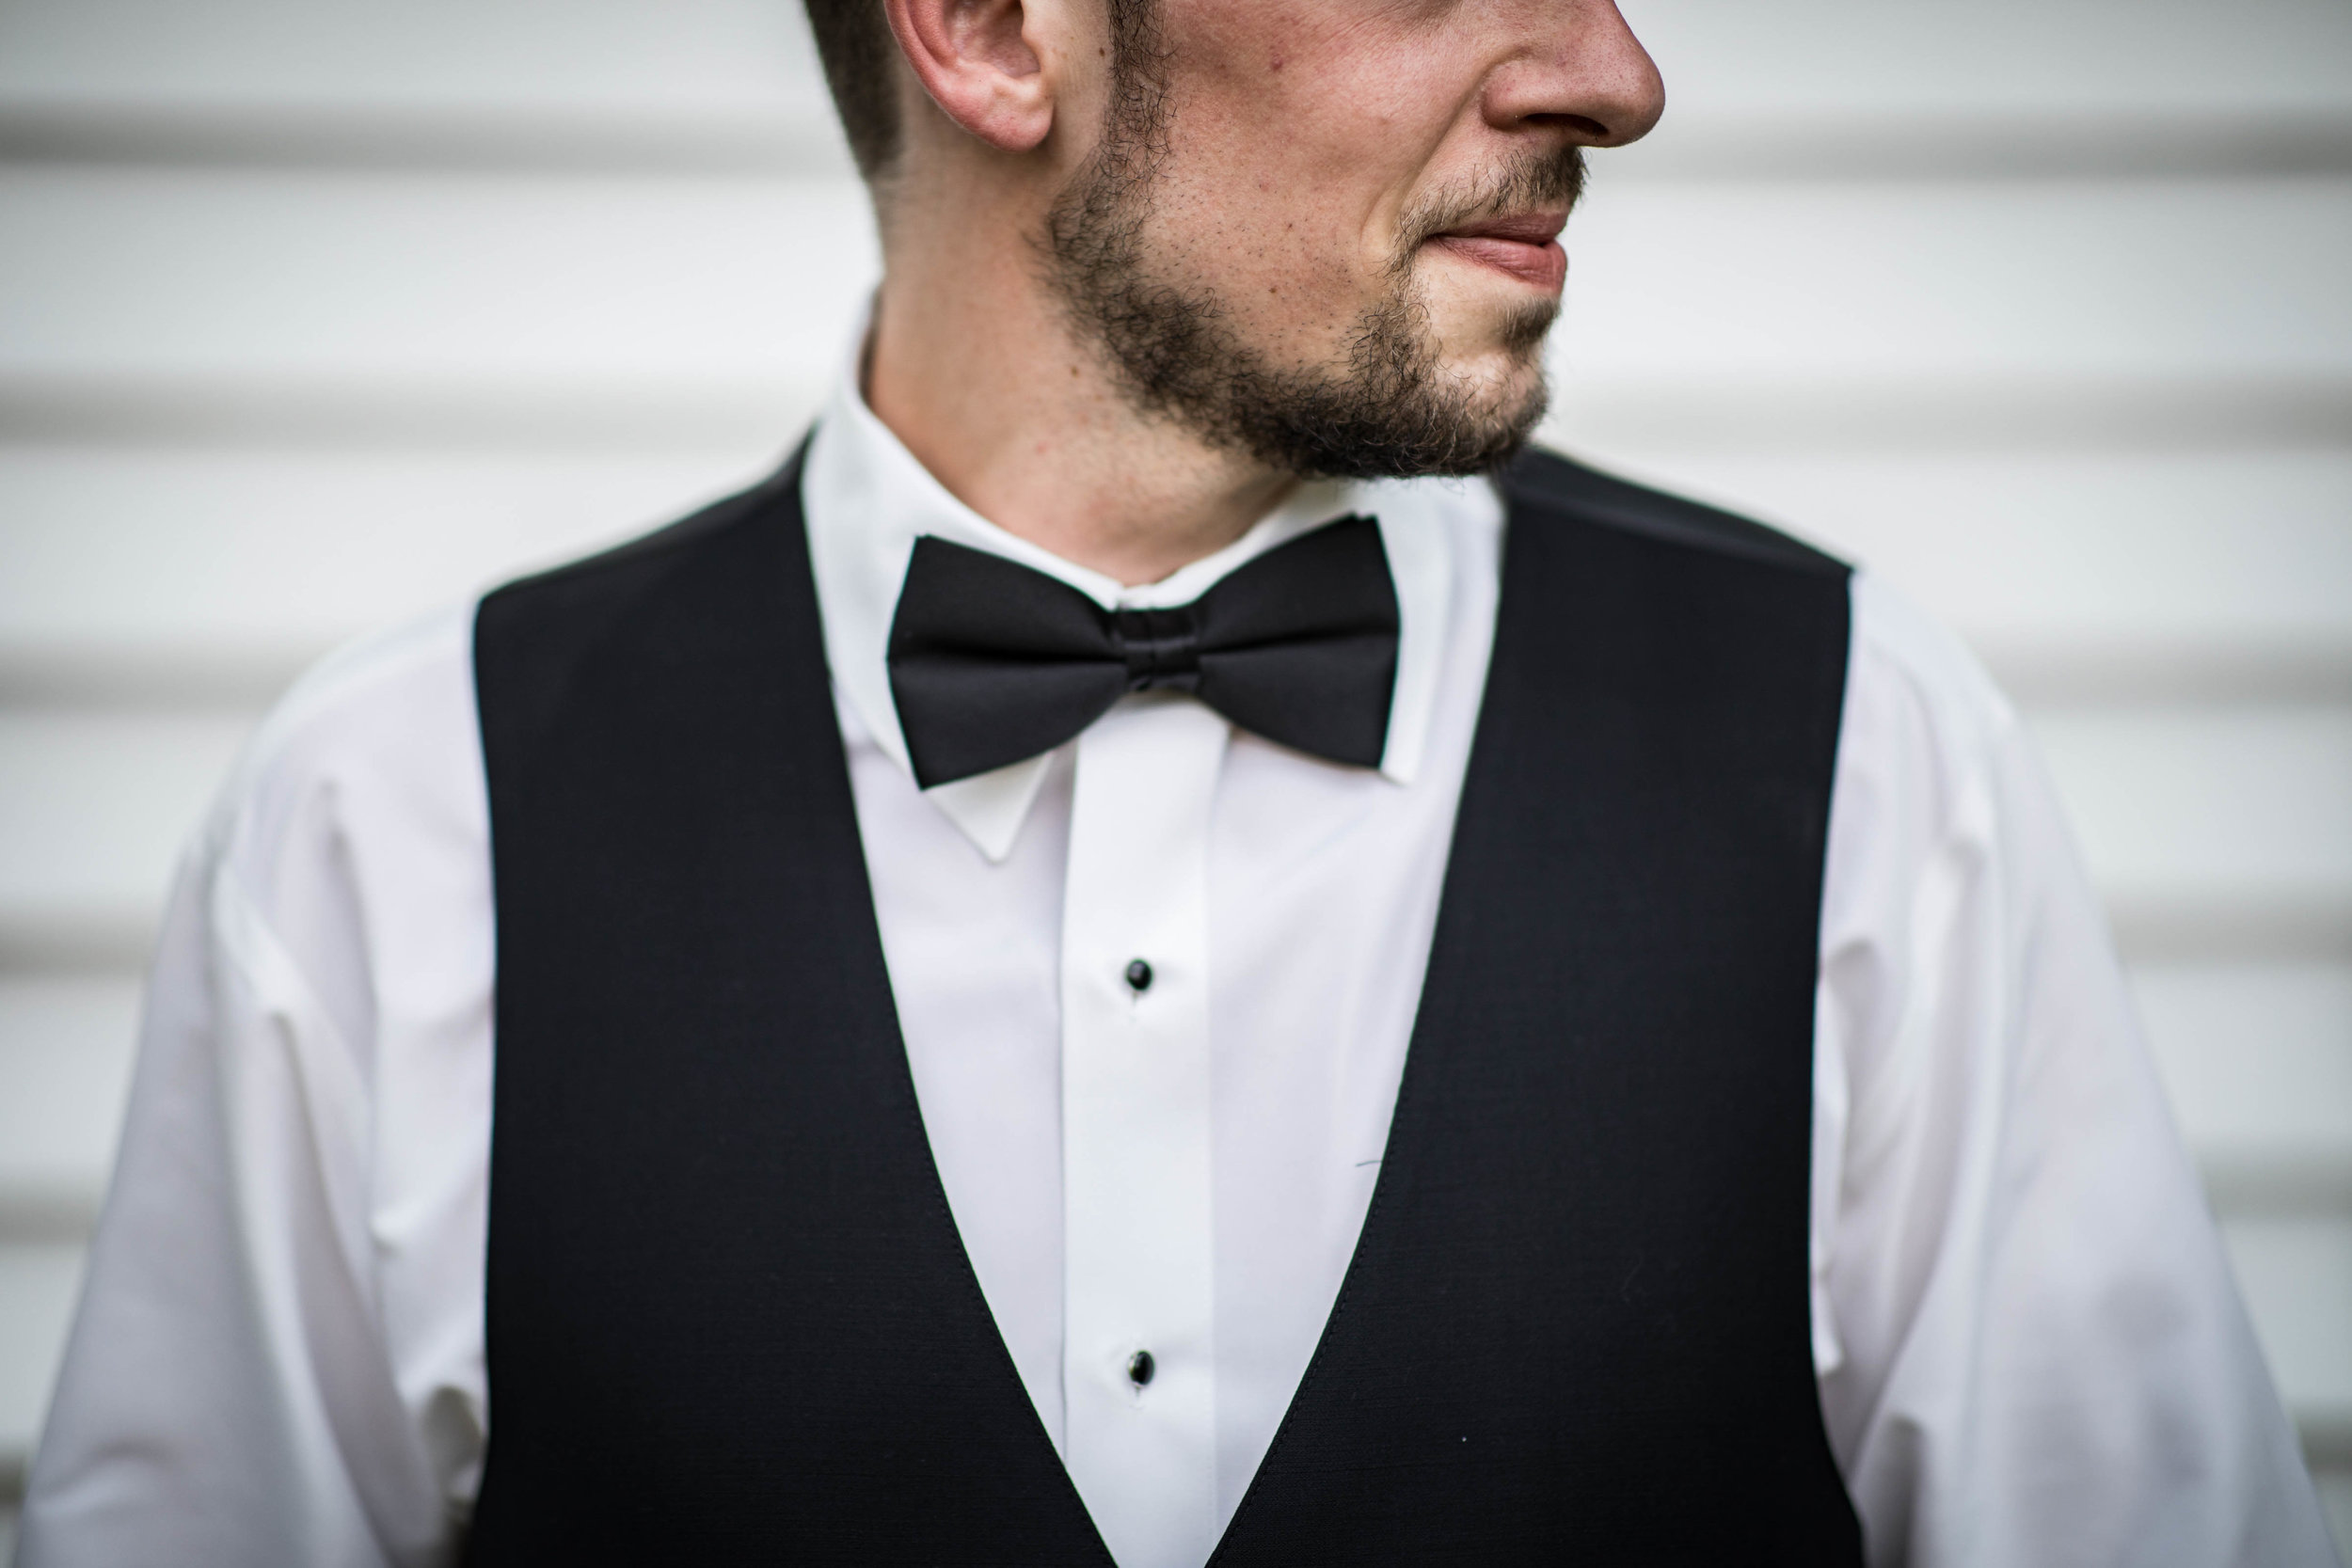 profile bowtie photo of the groom